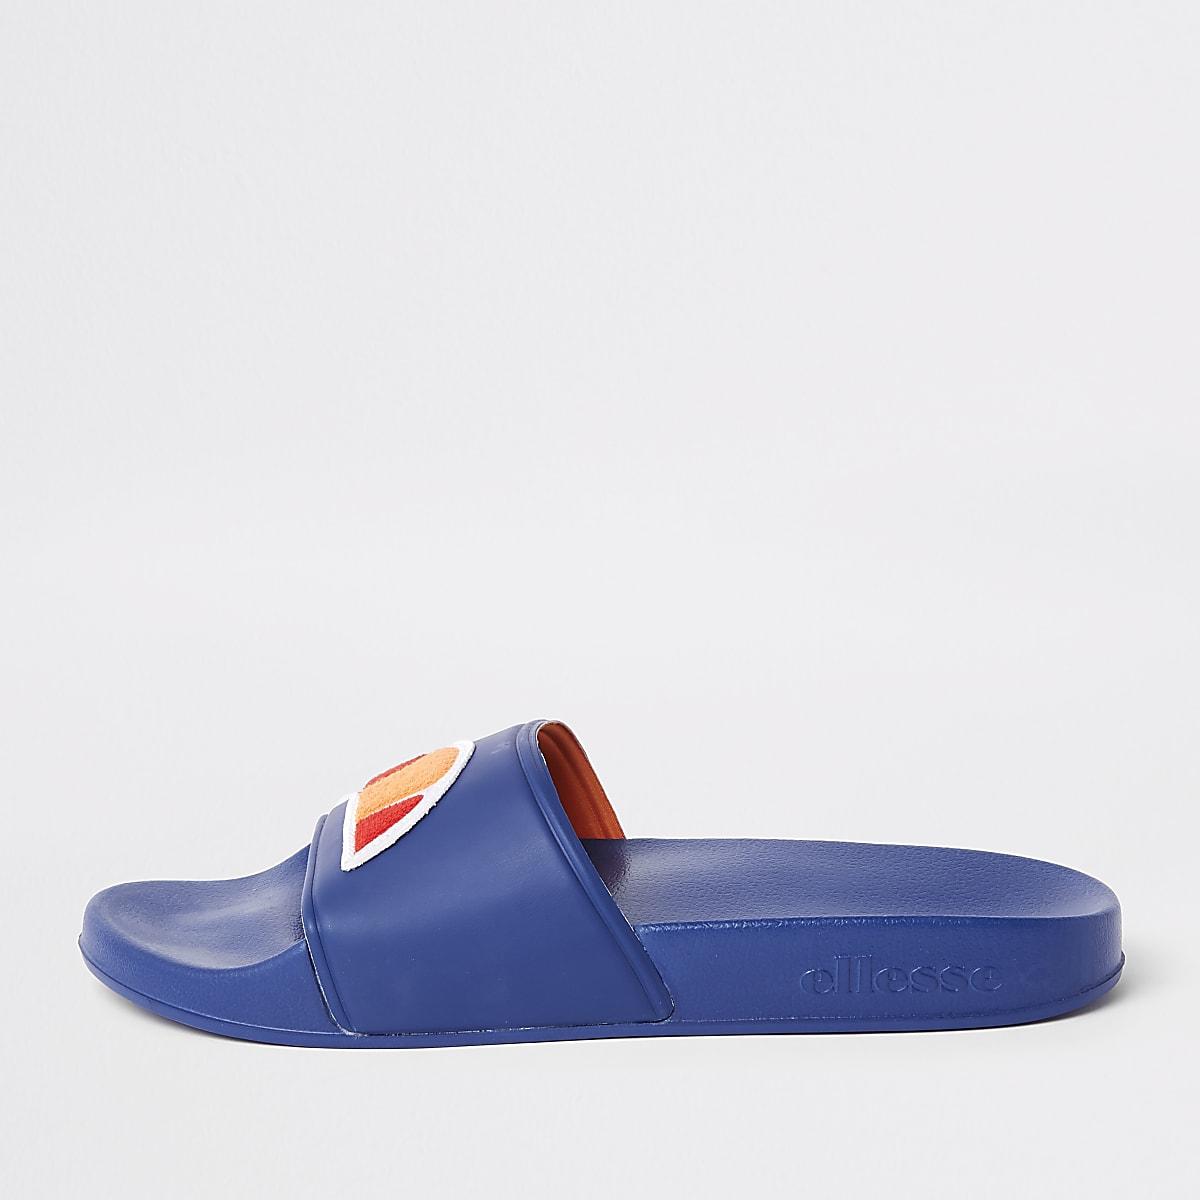 Ellesse blue sliders